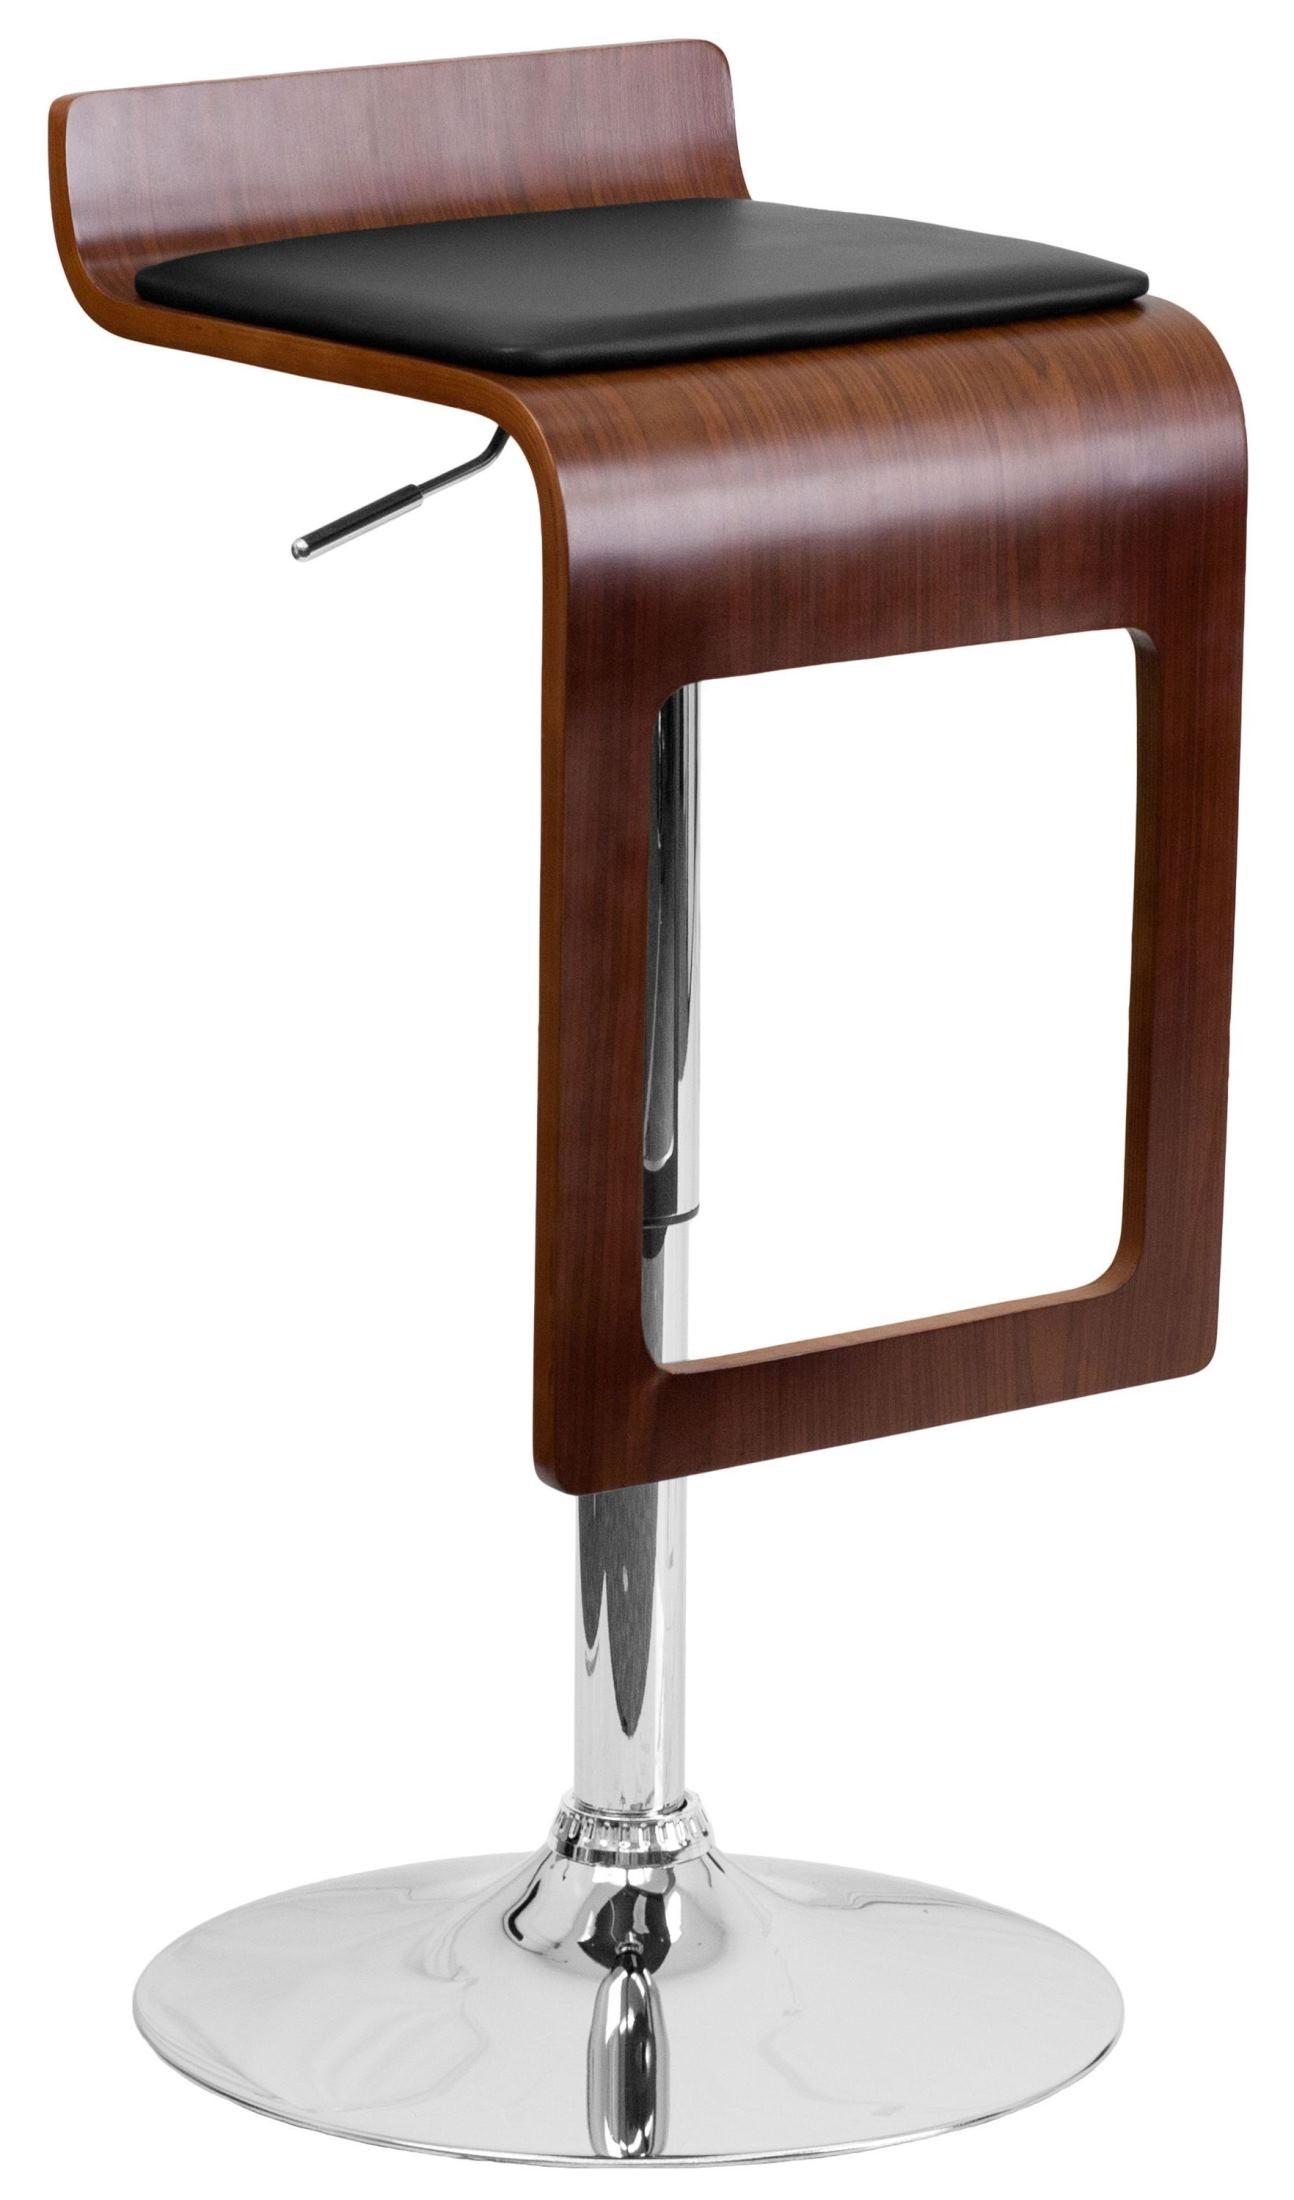 Walnut Bentwood Adjustable Black Bar Stool With Drop Frame